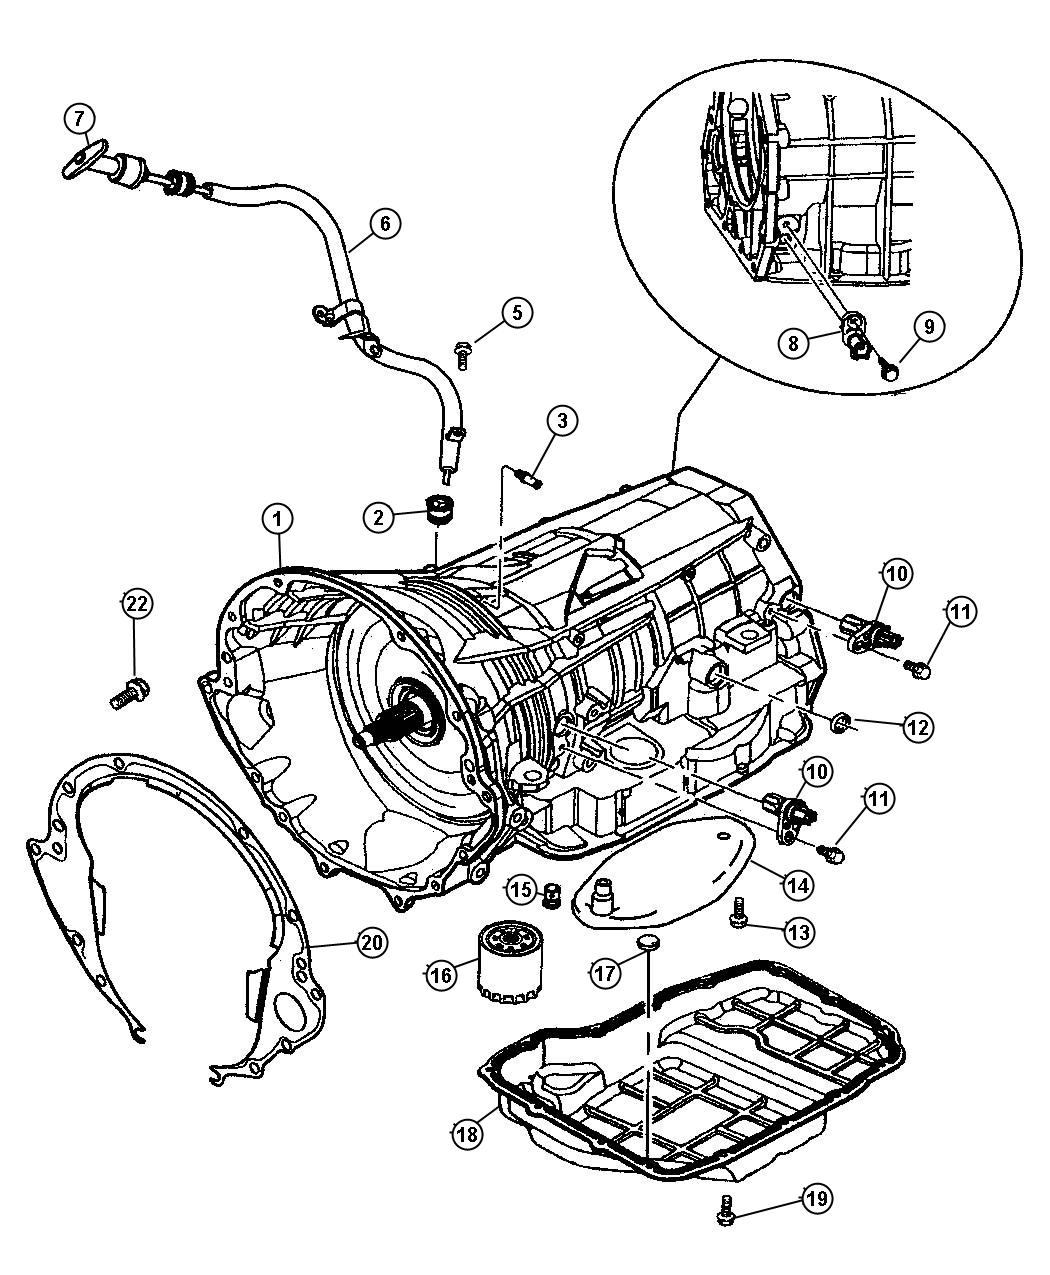 Wiring Diagram: 34 2001 Dodge Dakota Parts Diagram